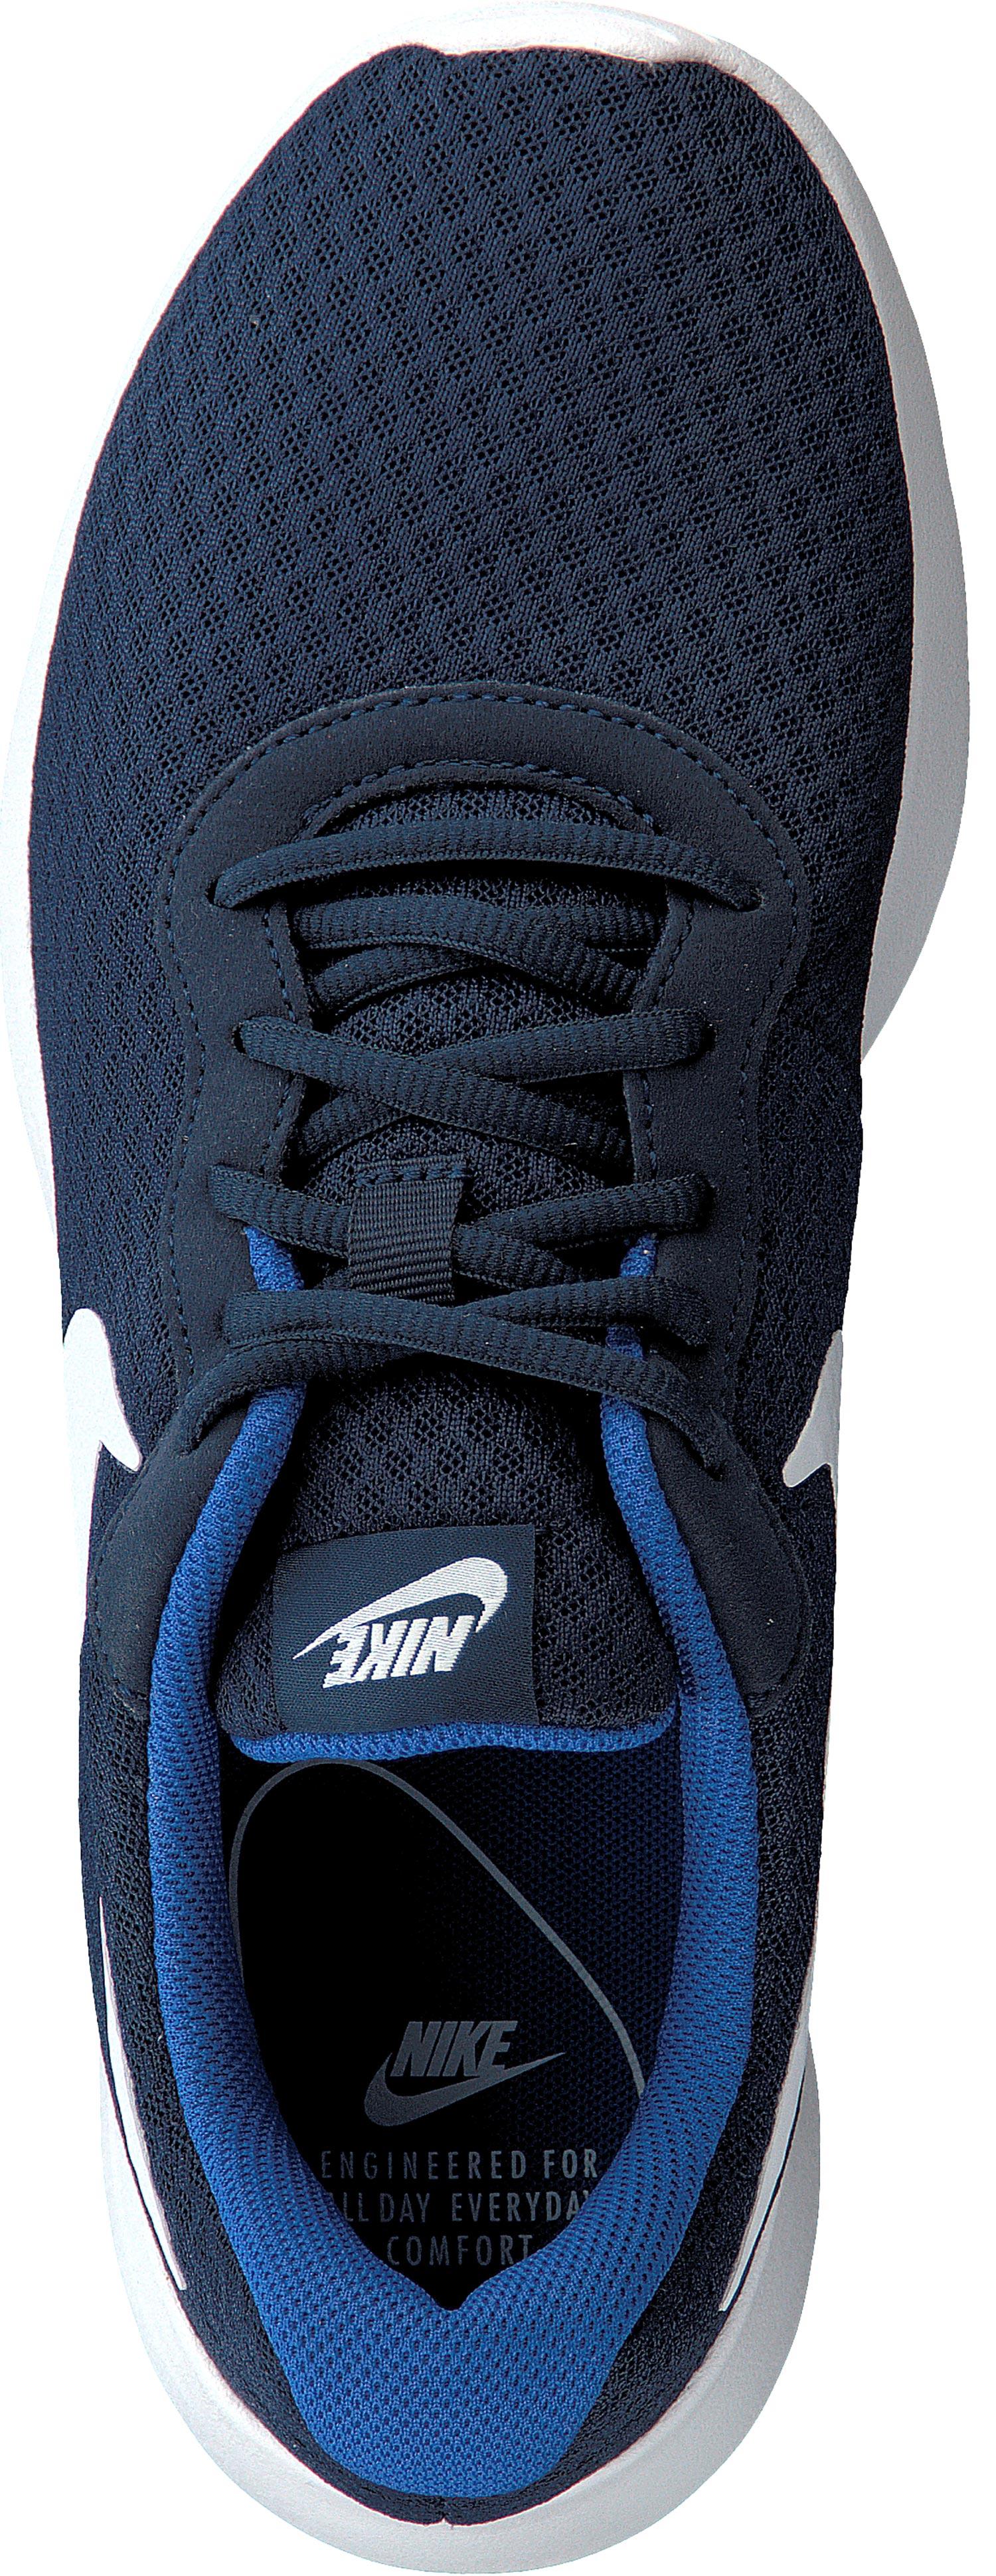 NIKE TANJUN Sneakers Uomo Scarpe da corsa Ginnastica 812654 414 blu navy NUOVO Scarpe classiche da uomo